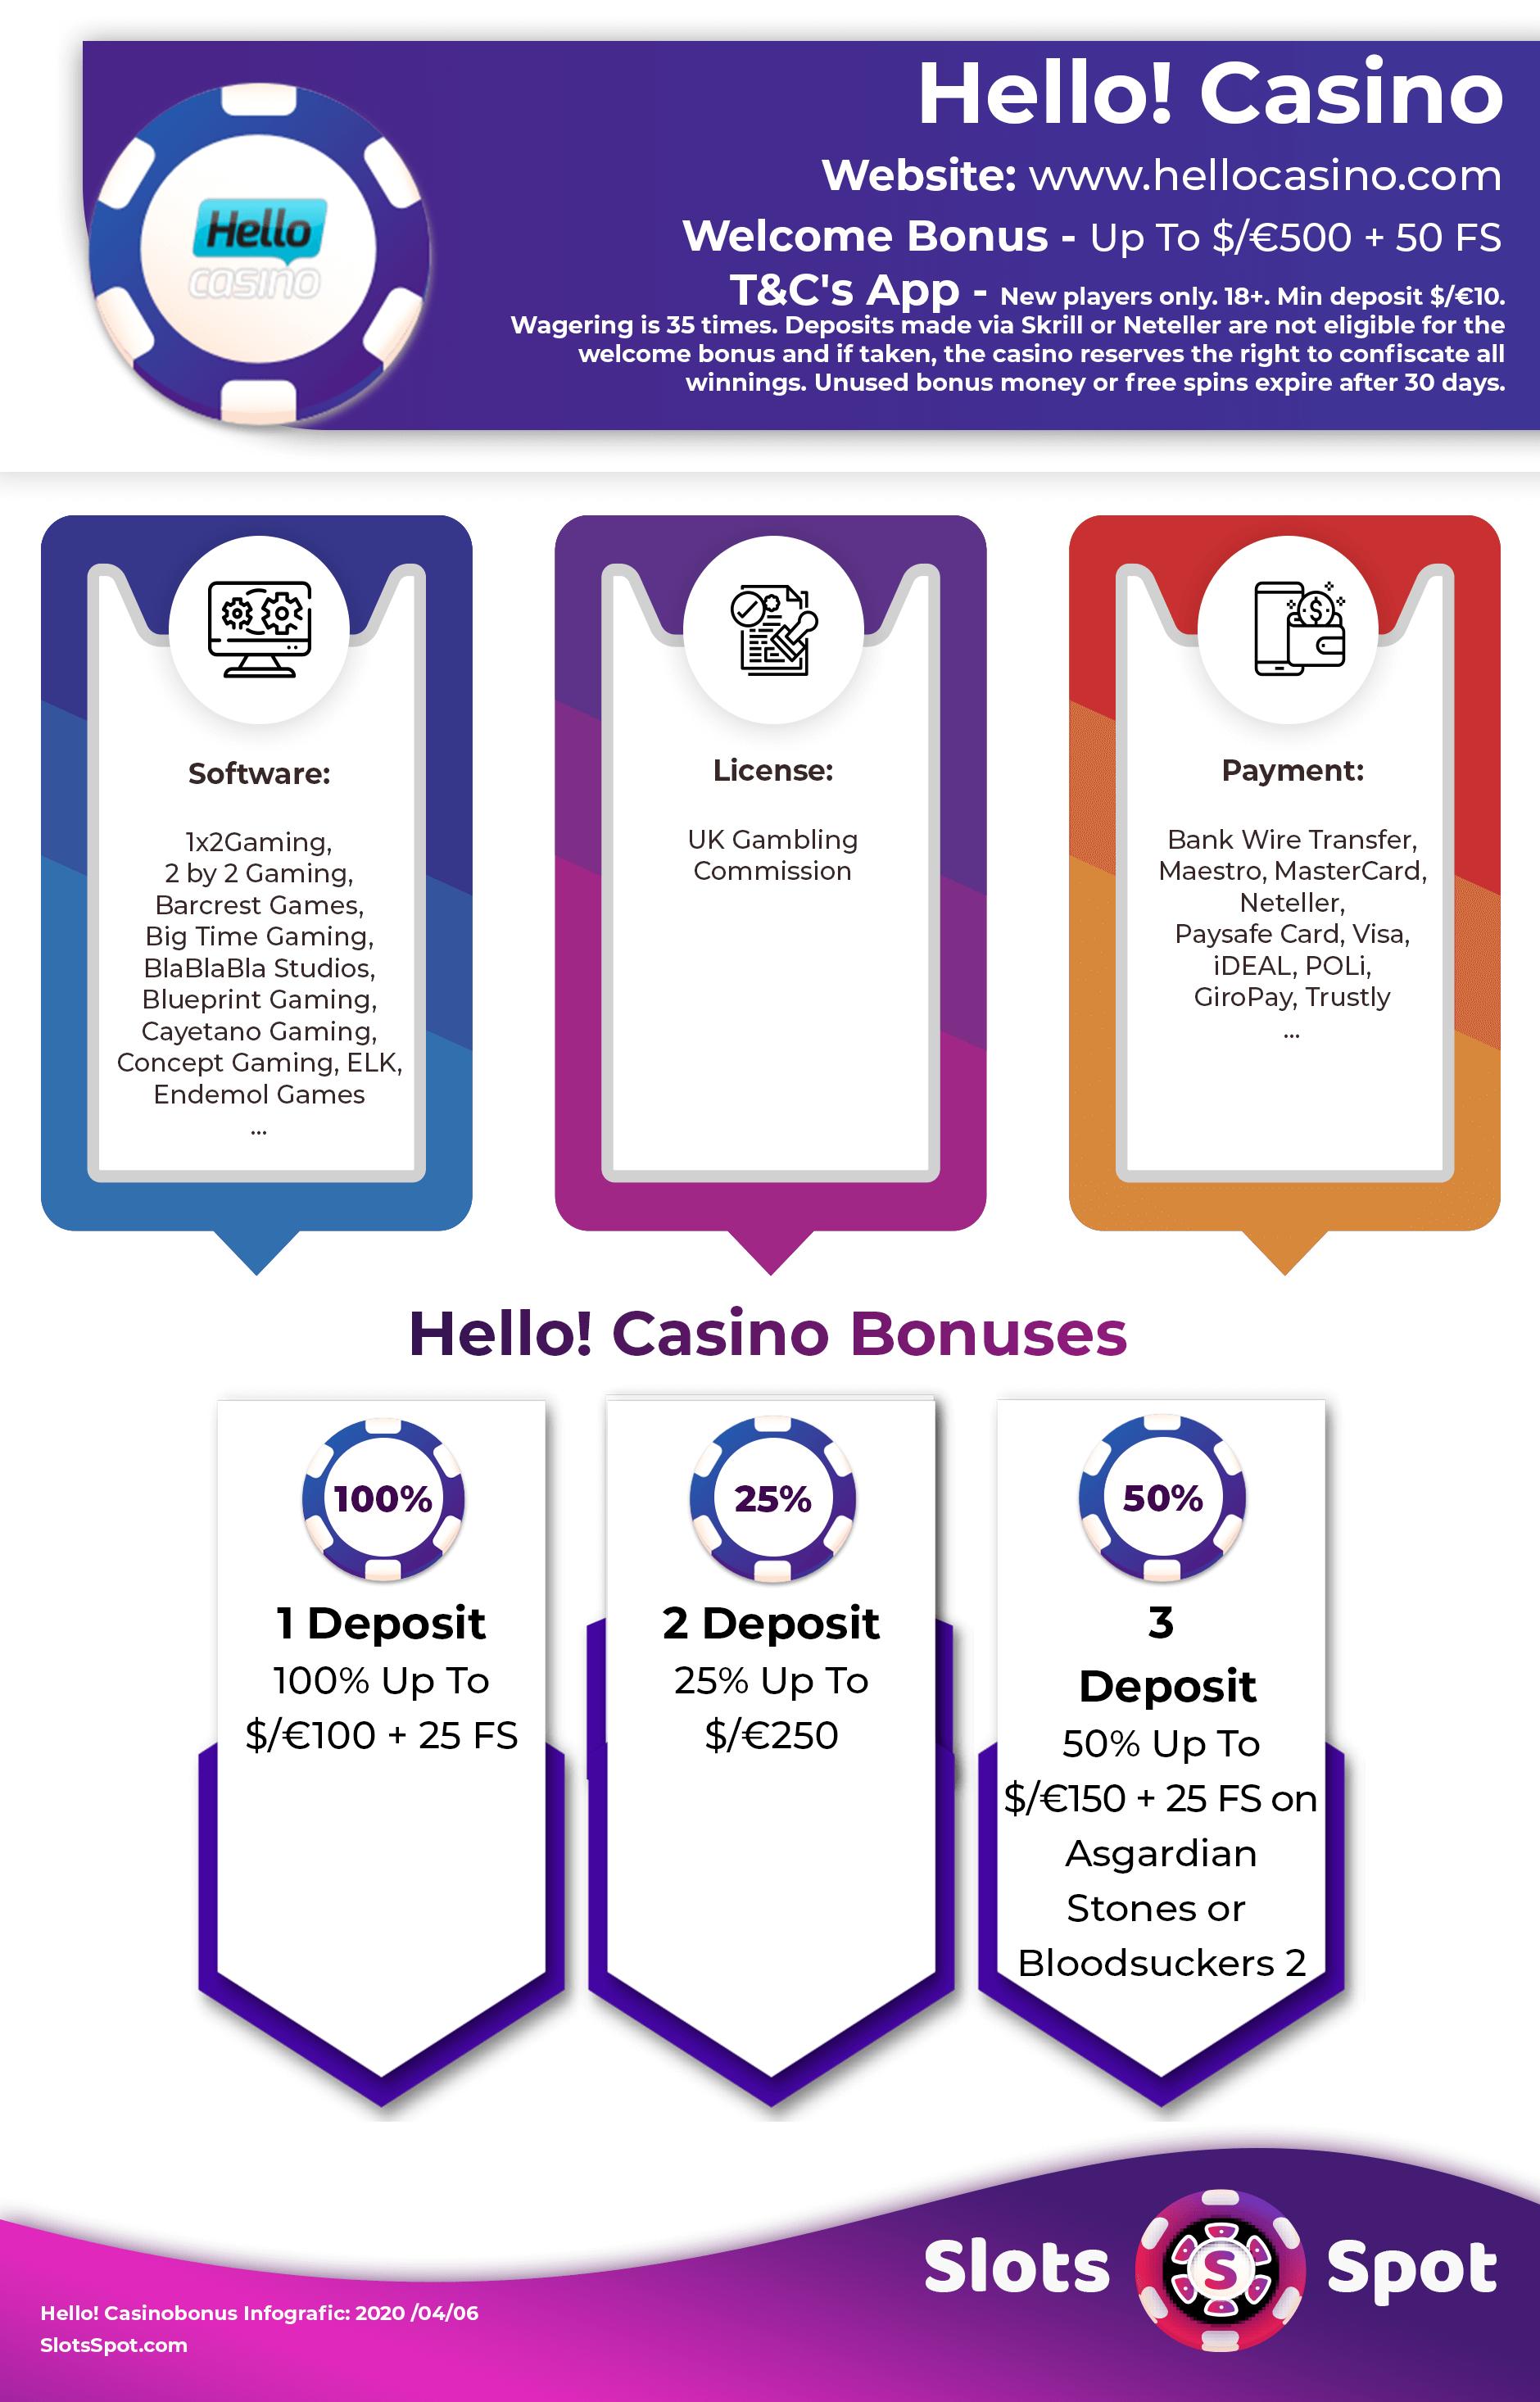 Hello Casino No Deposit Coupons 2020